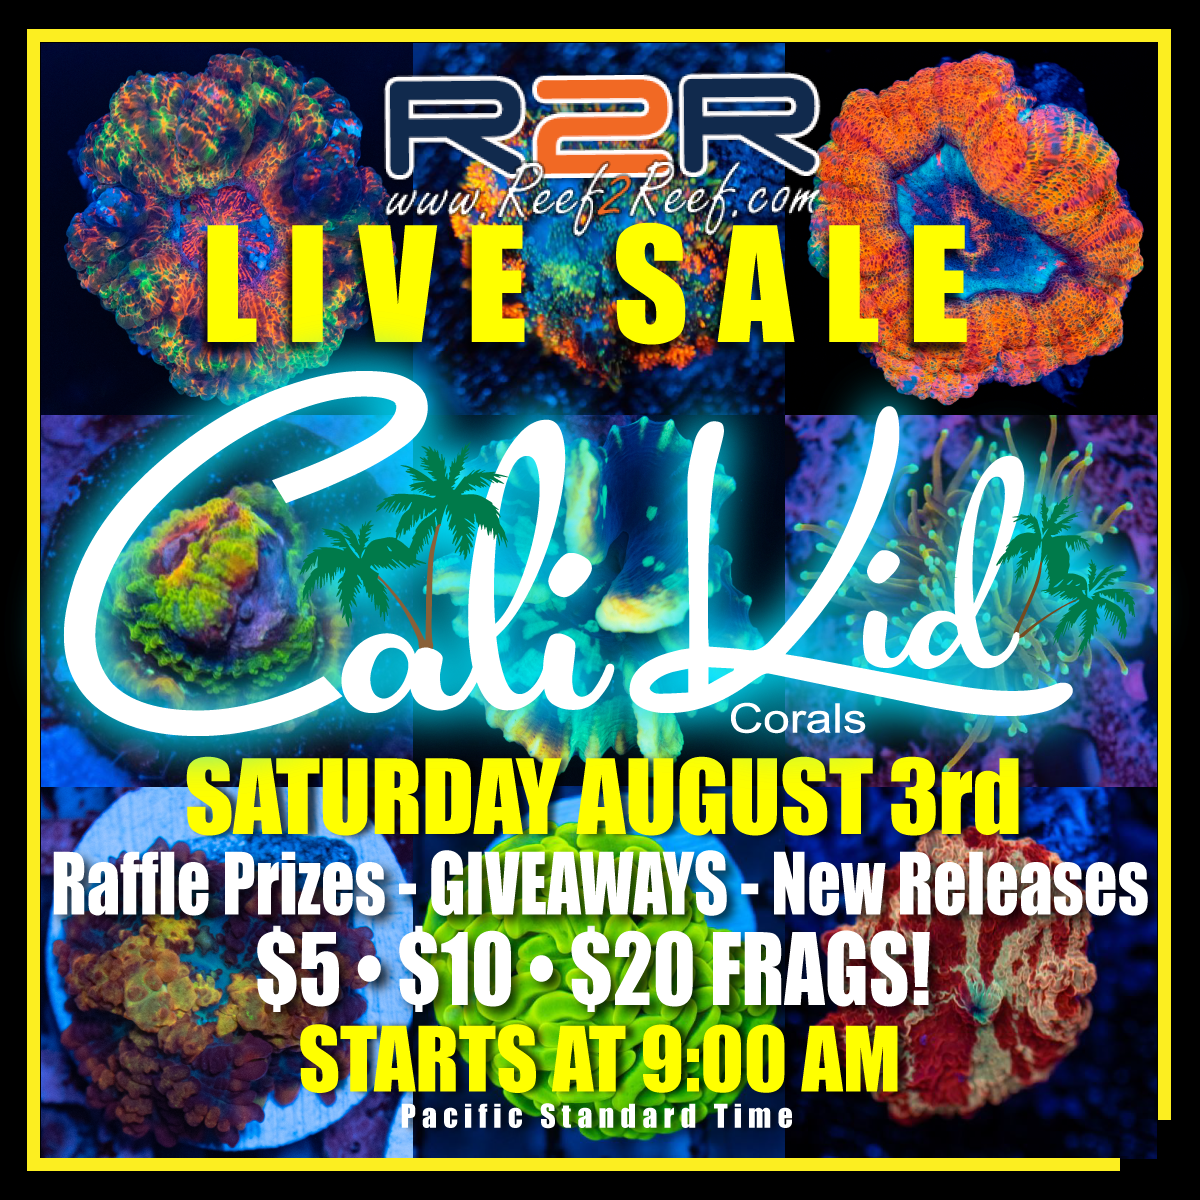 R2R Live Sale Final Flyer #1.png